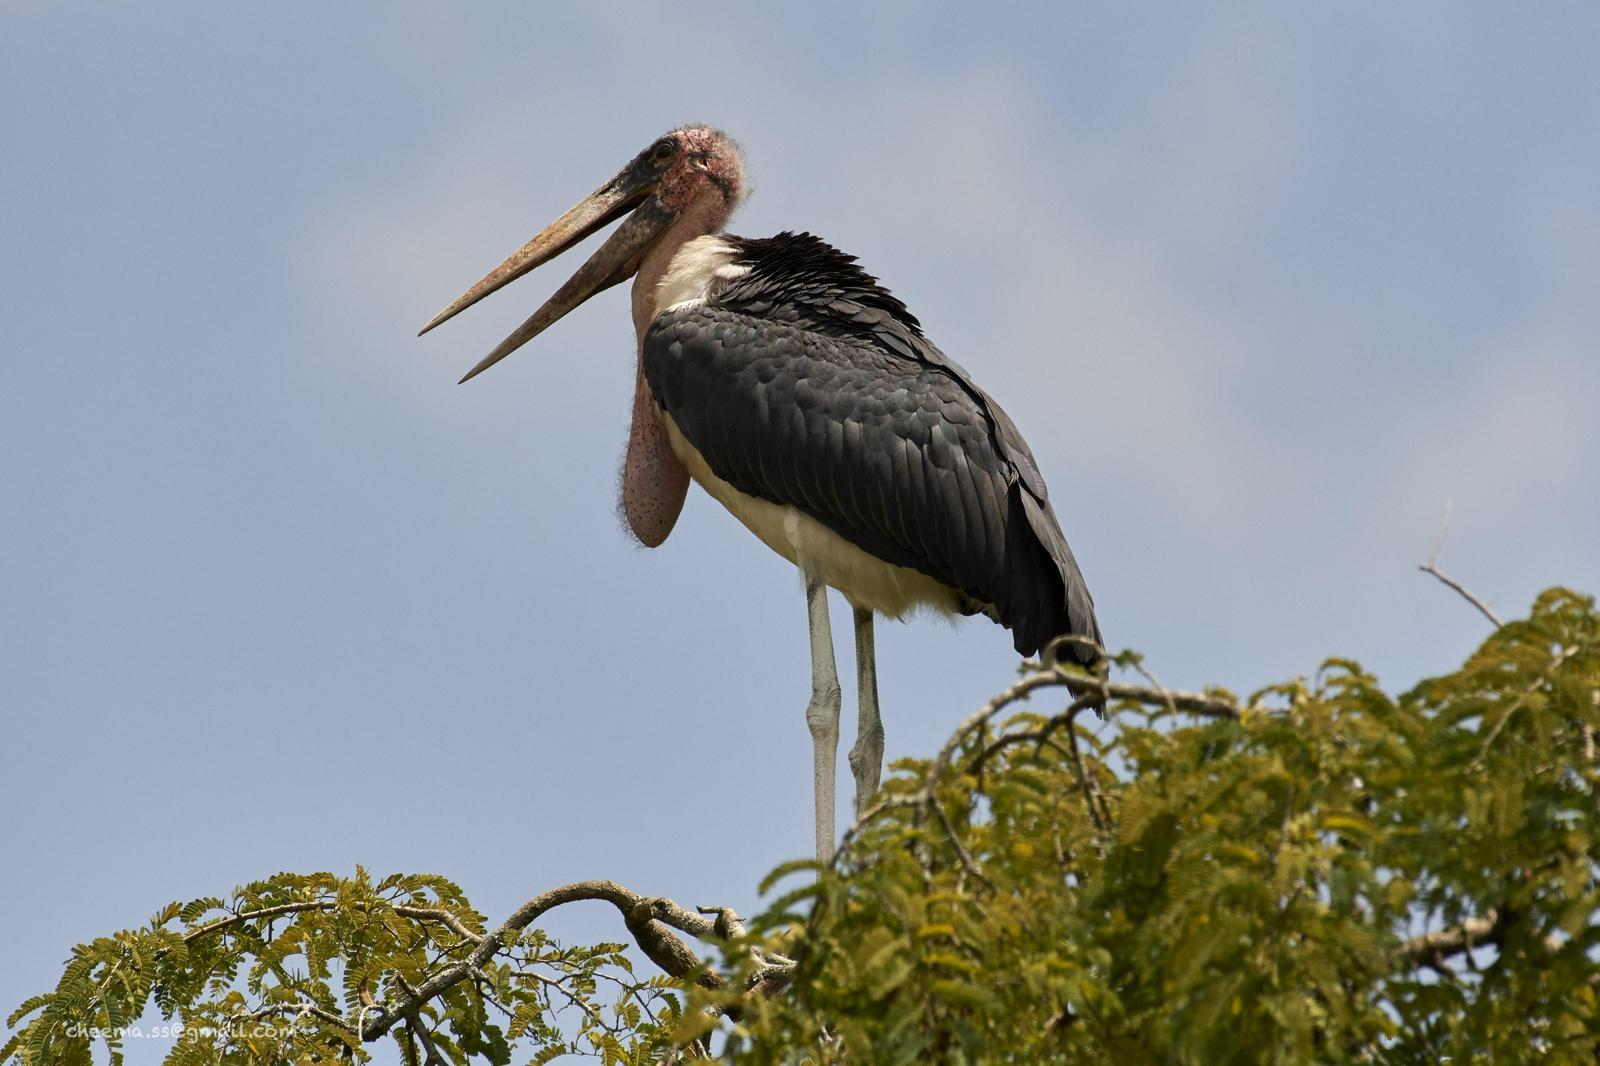 Marabou Stork Photo by Simepreet Cheema